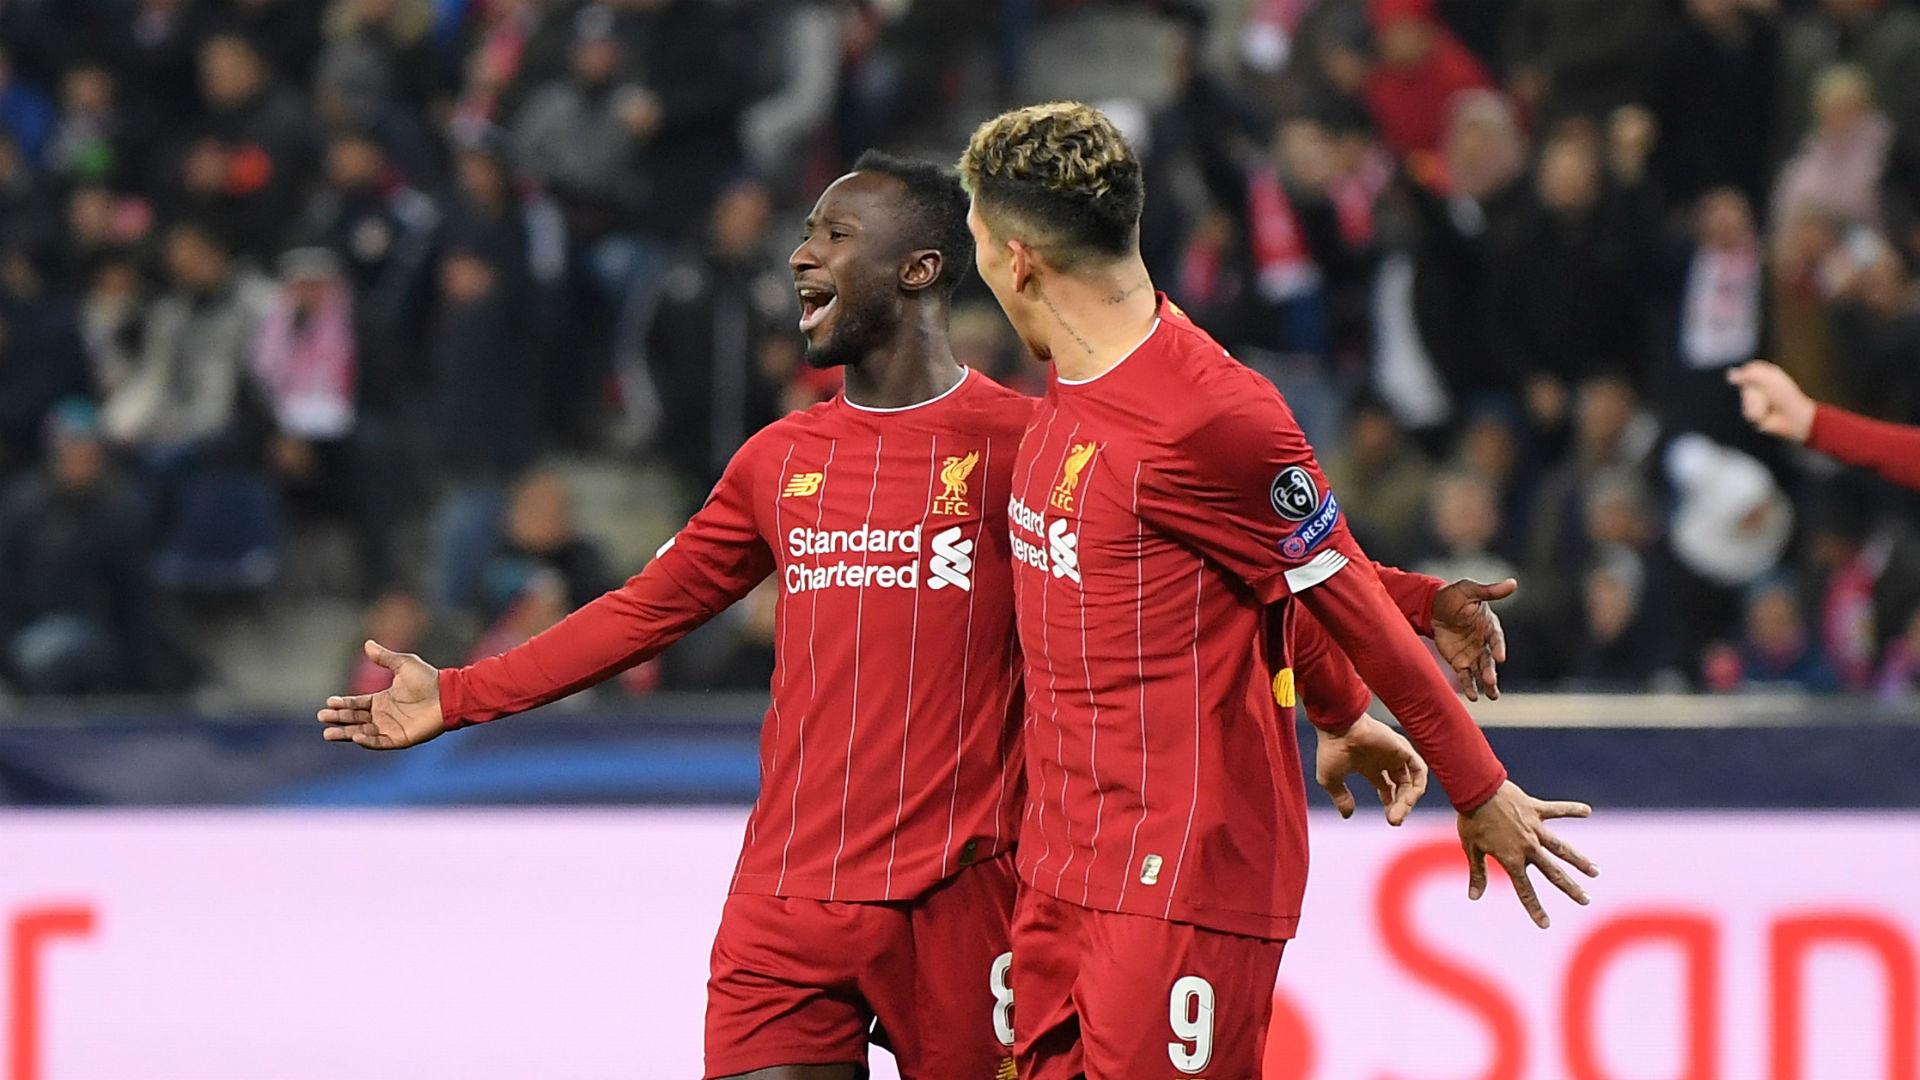 Salzburg 0-2 Liverpool: Keita and Salah see Reds through in thrilling clash